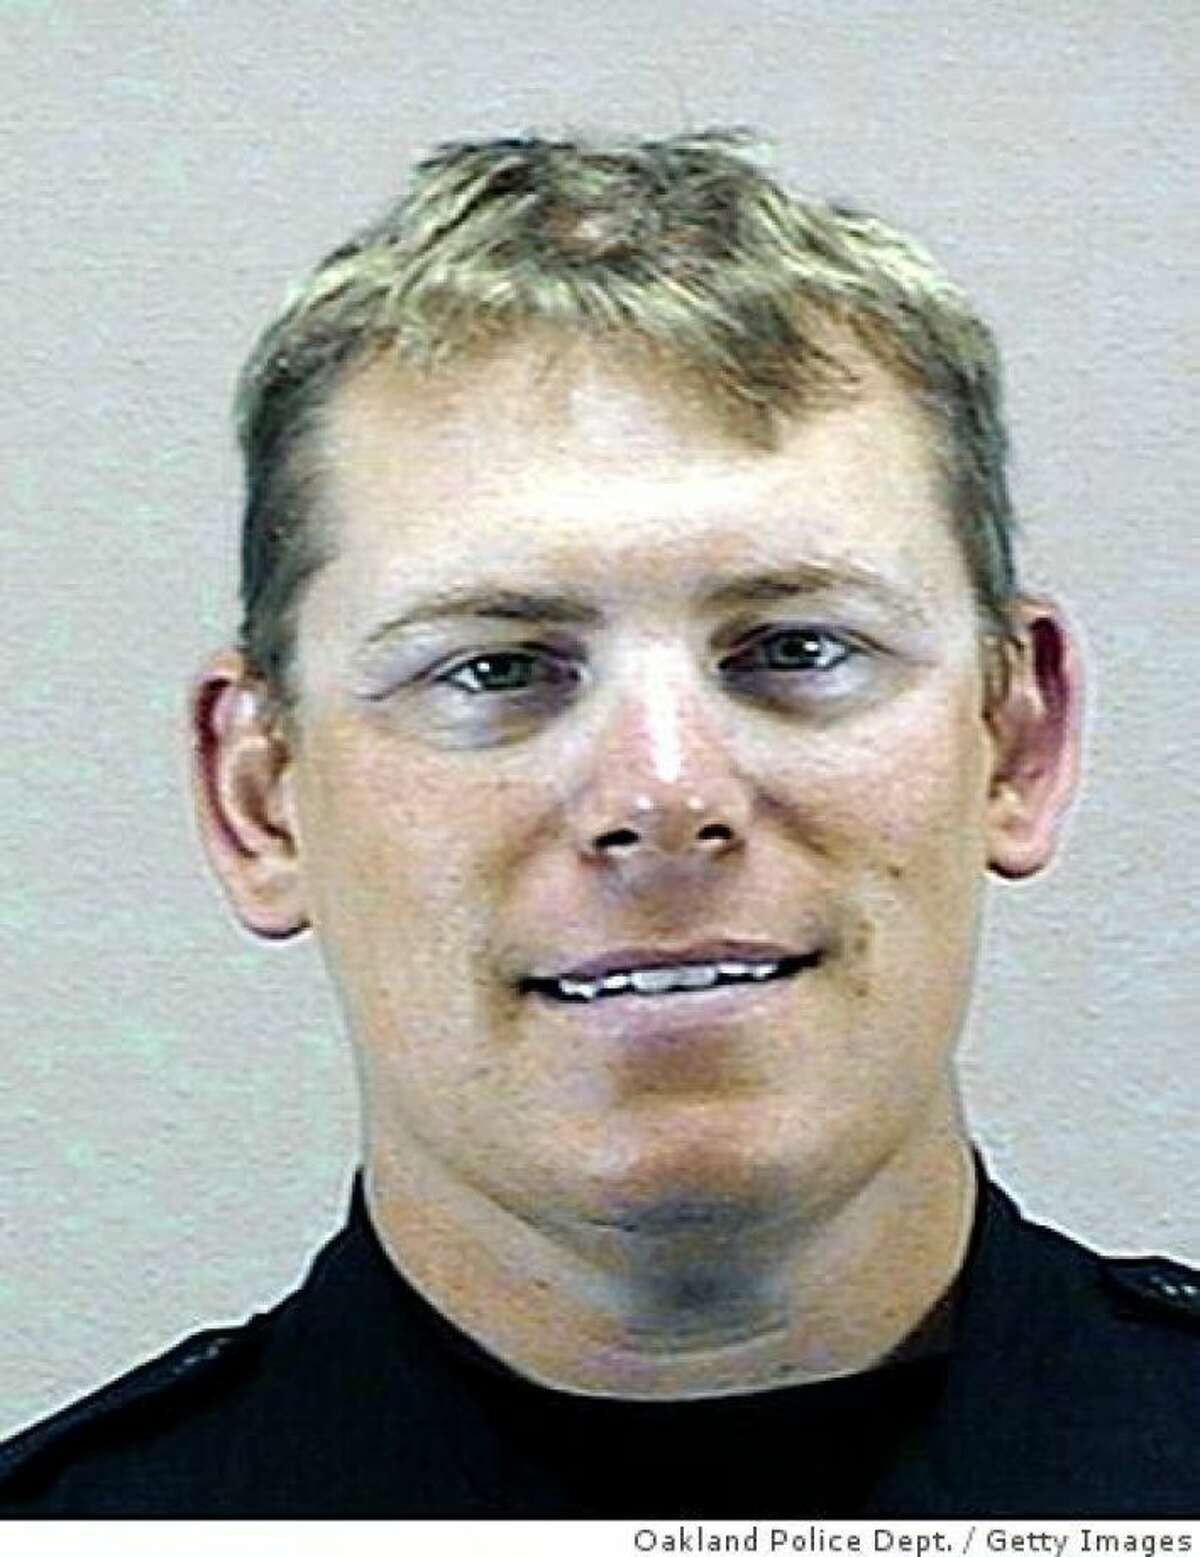 Oakland Police Department Sgt. Mark Dunakin